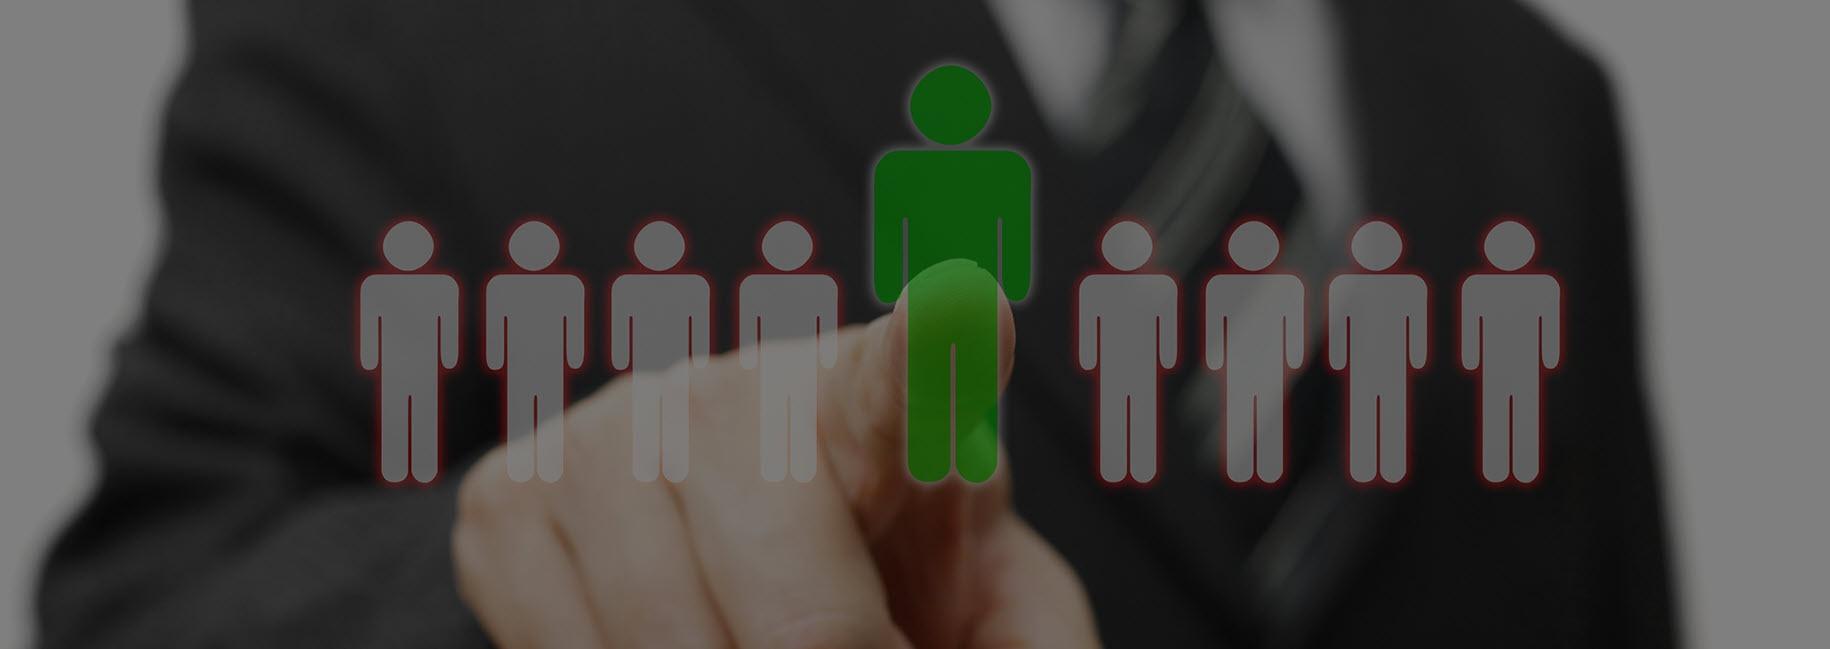 Contract vs. FTE hiring